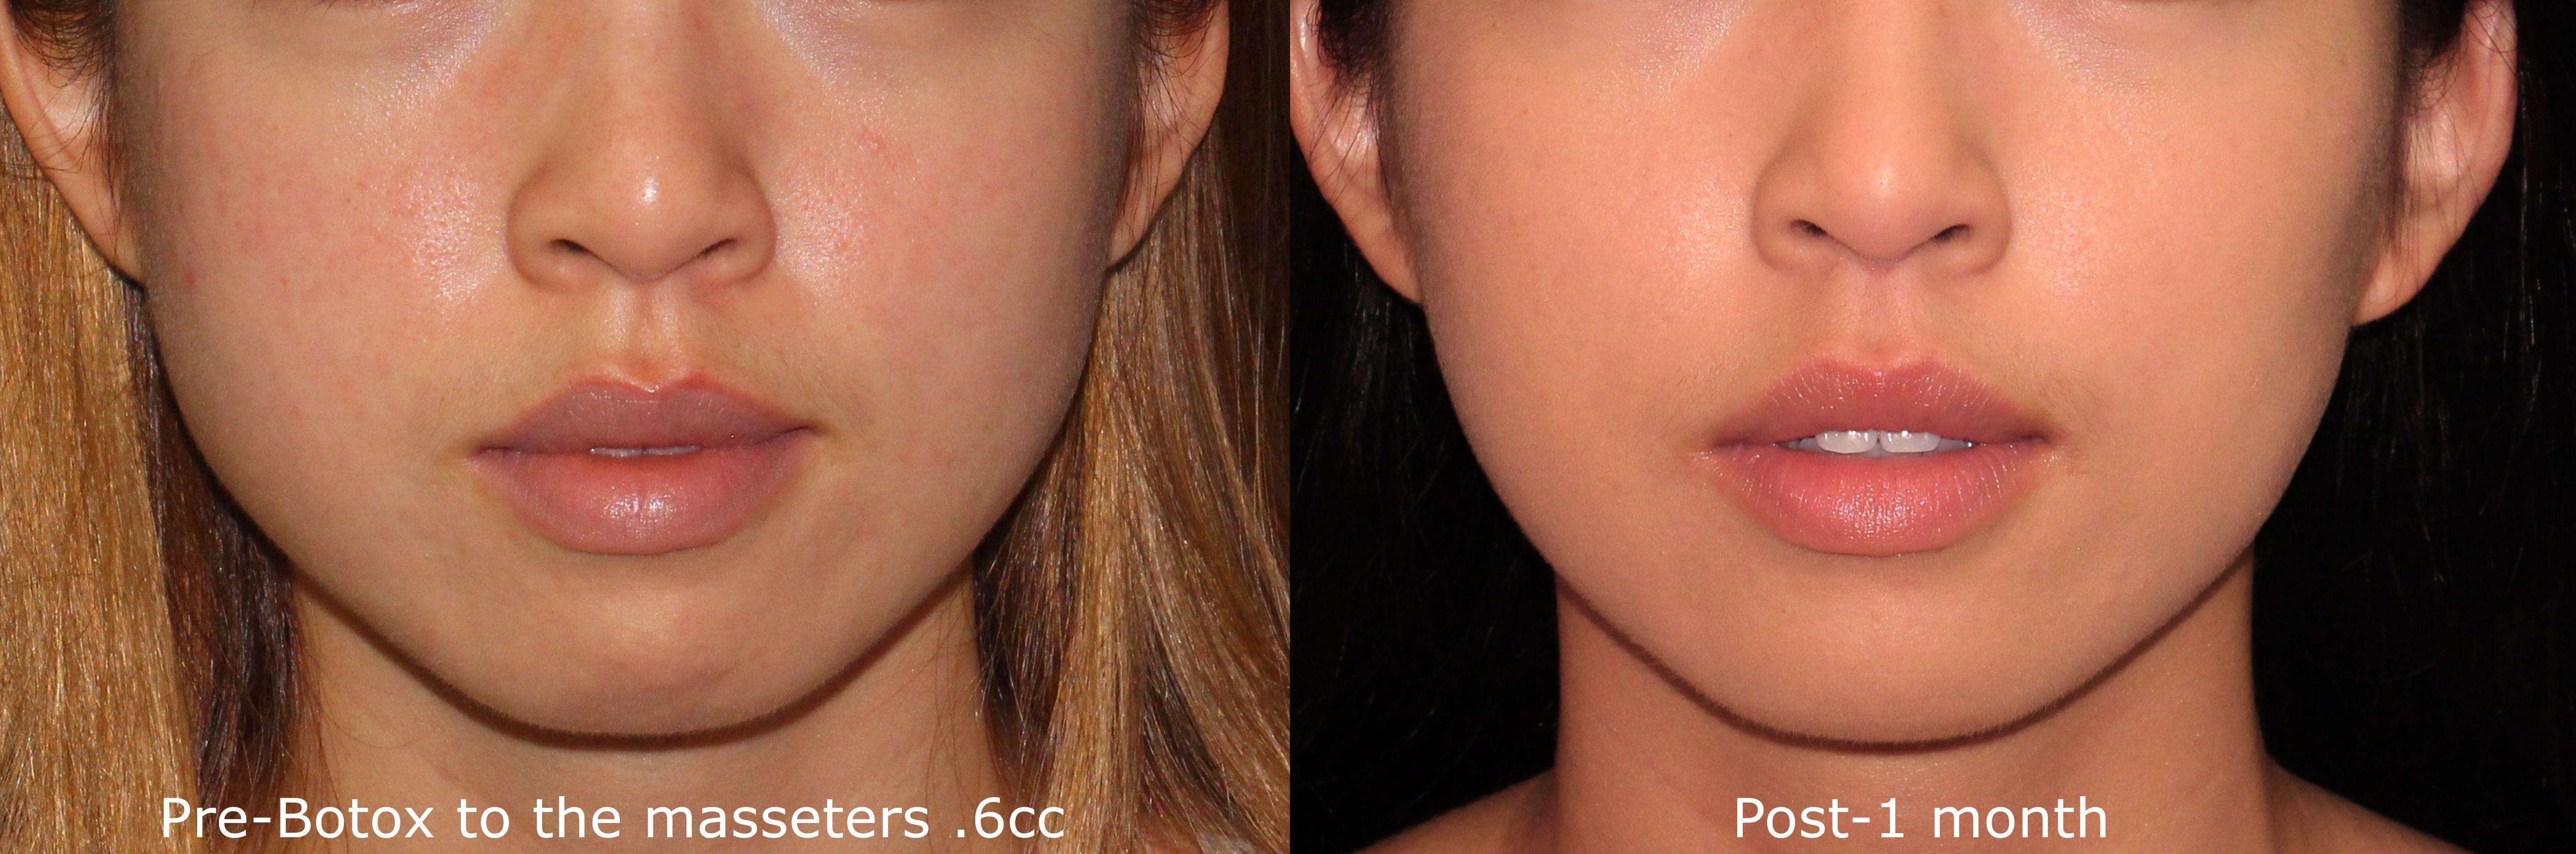 Facial Sleimming Botoxi ulevaade Awesome kaalulangus sooki